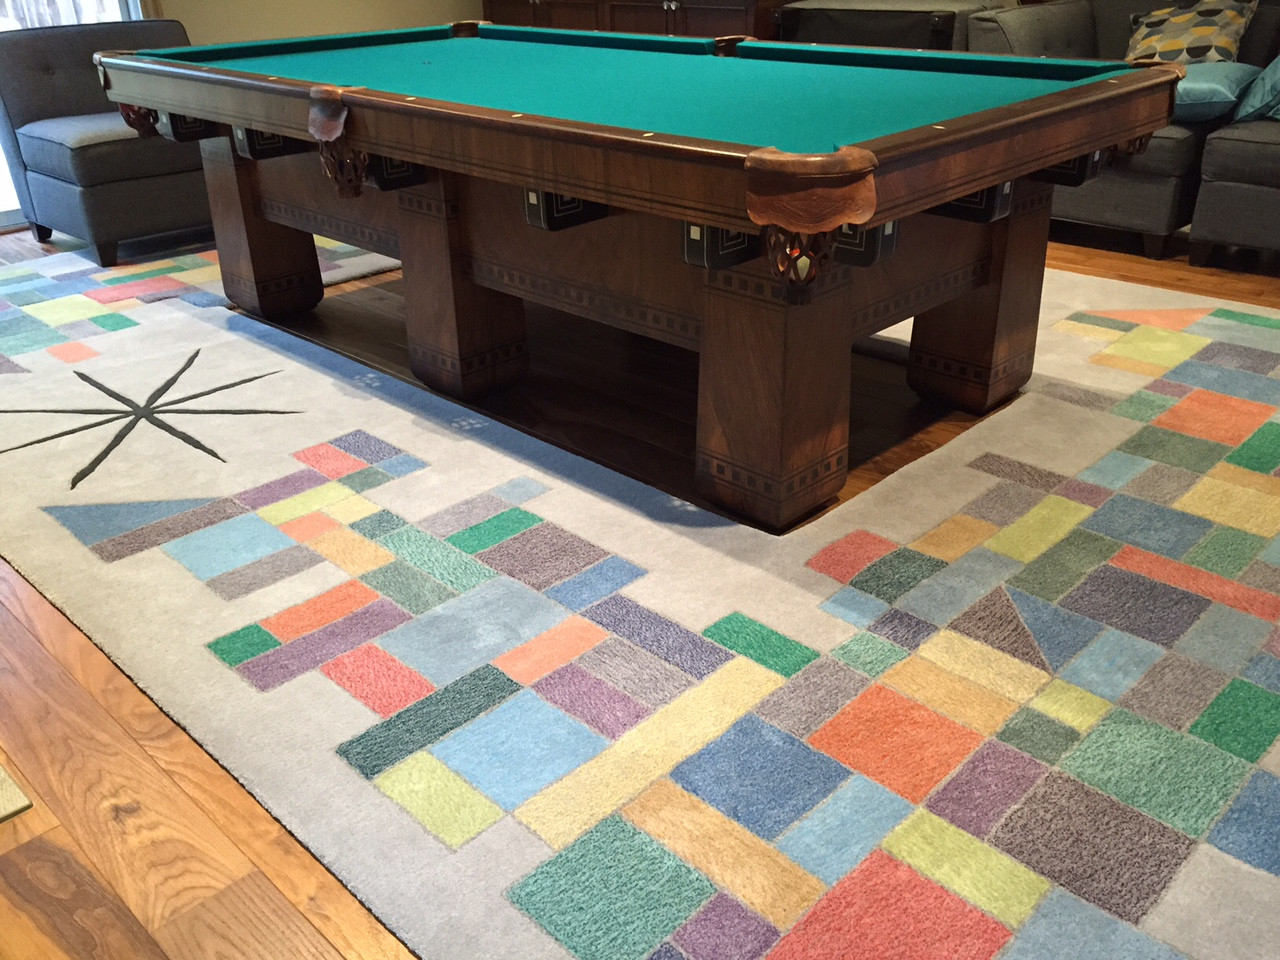 Les Pool Table